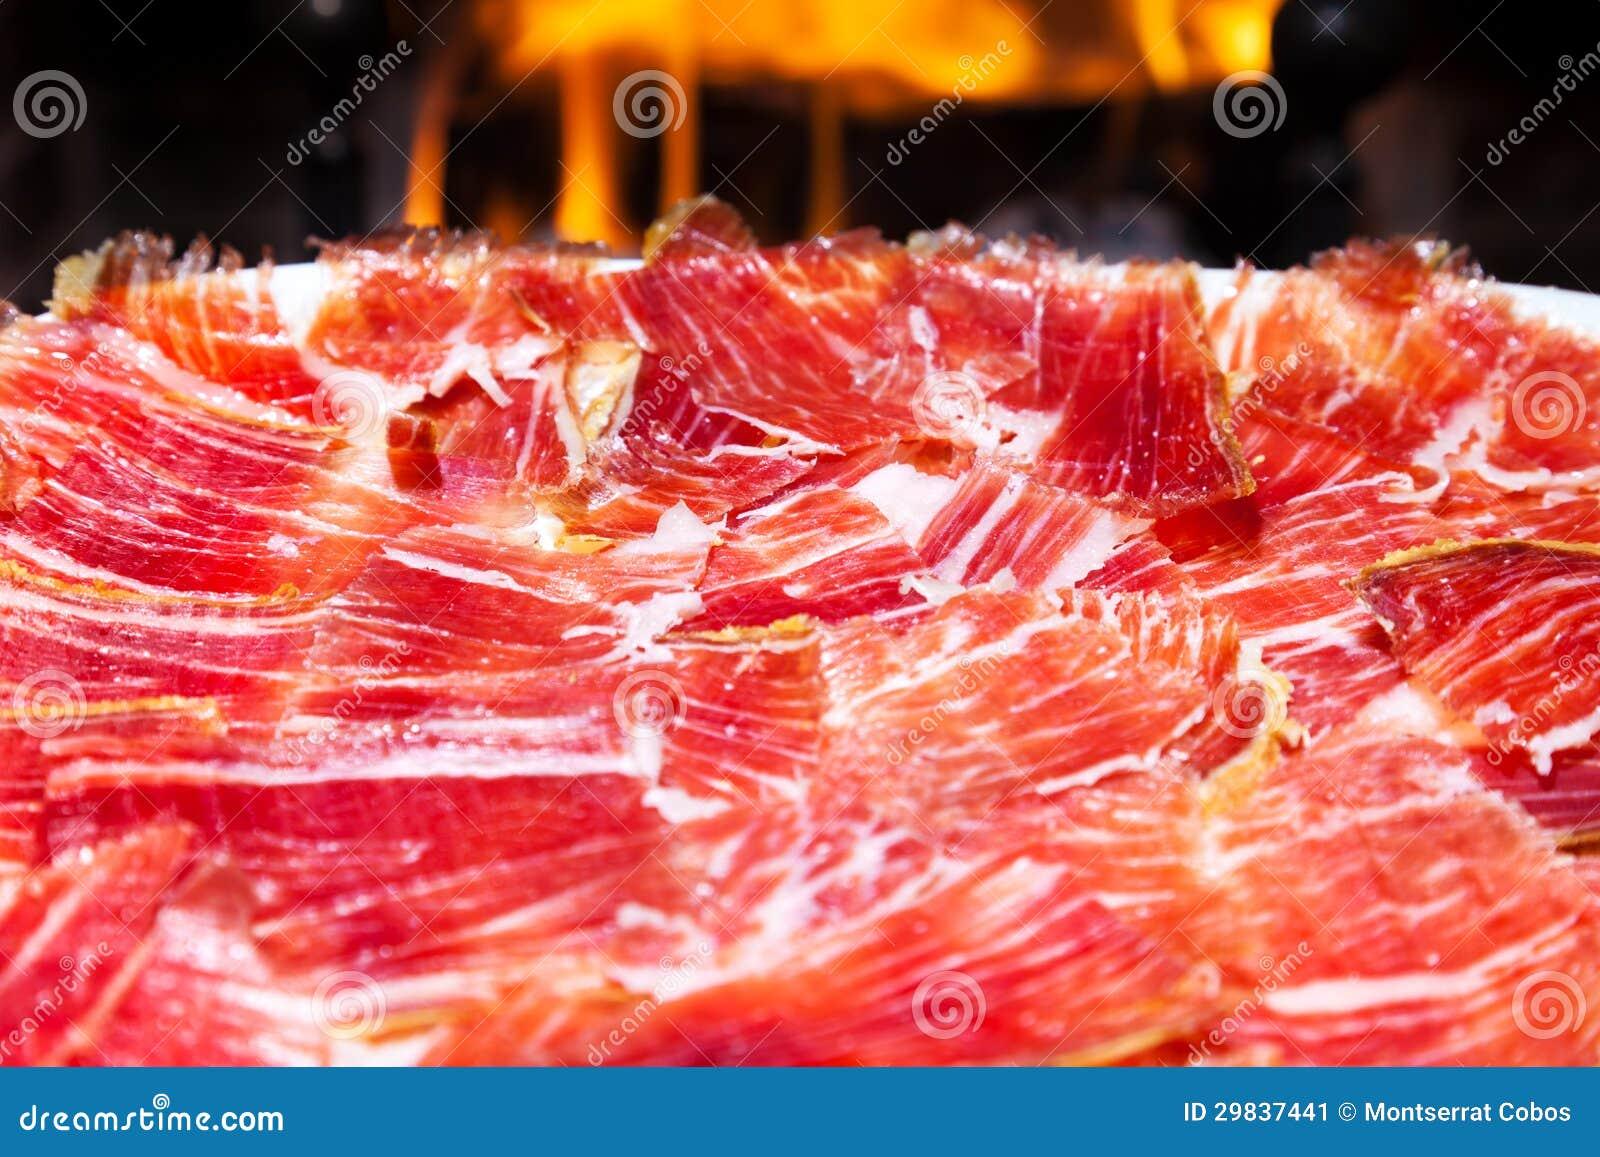 Placa do iberico espanhol do jamon